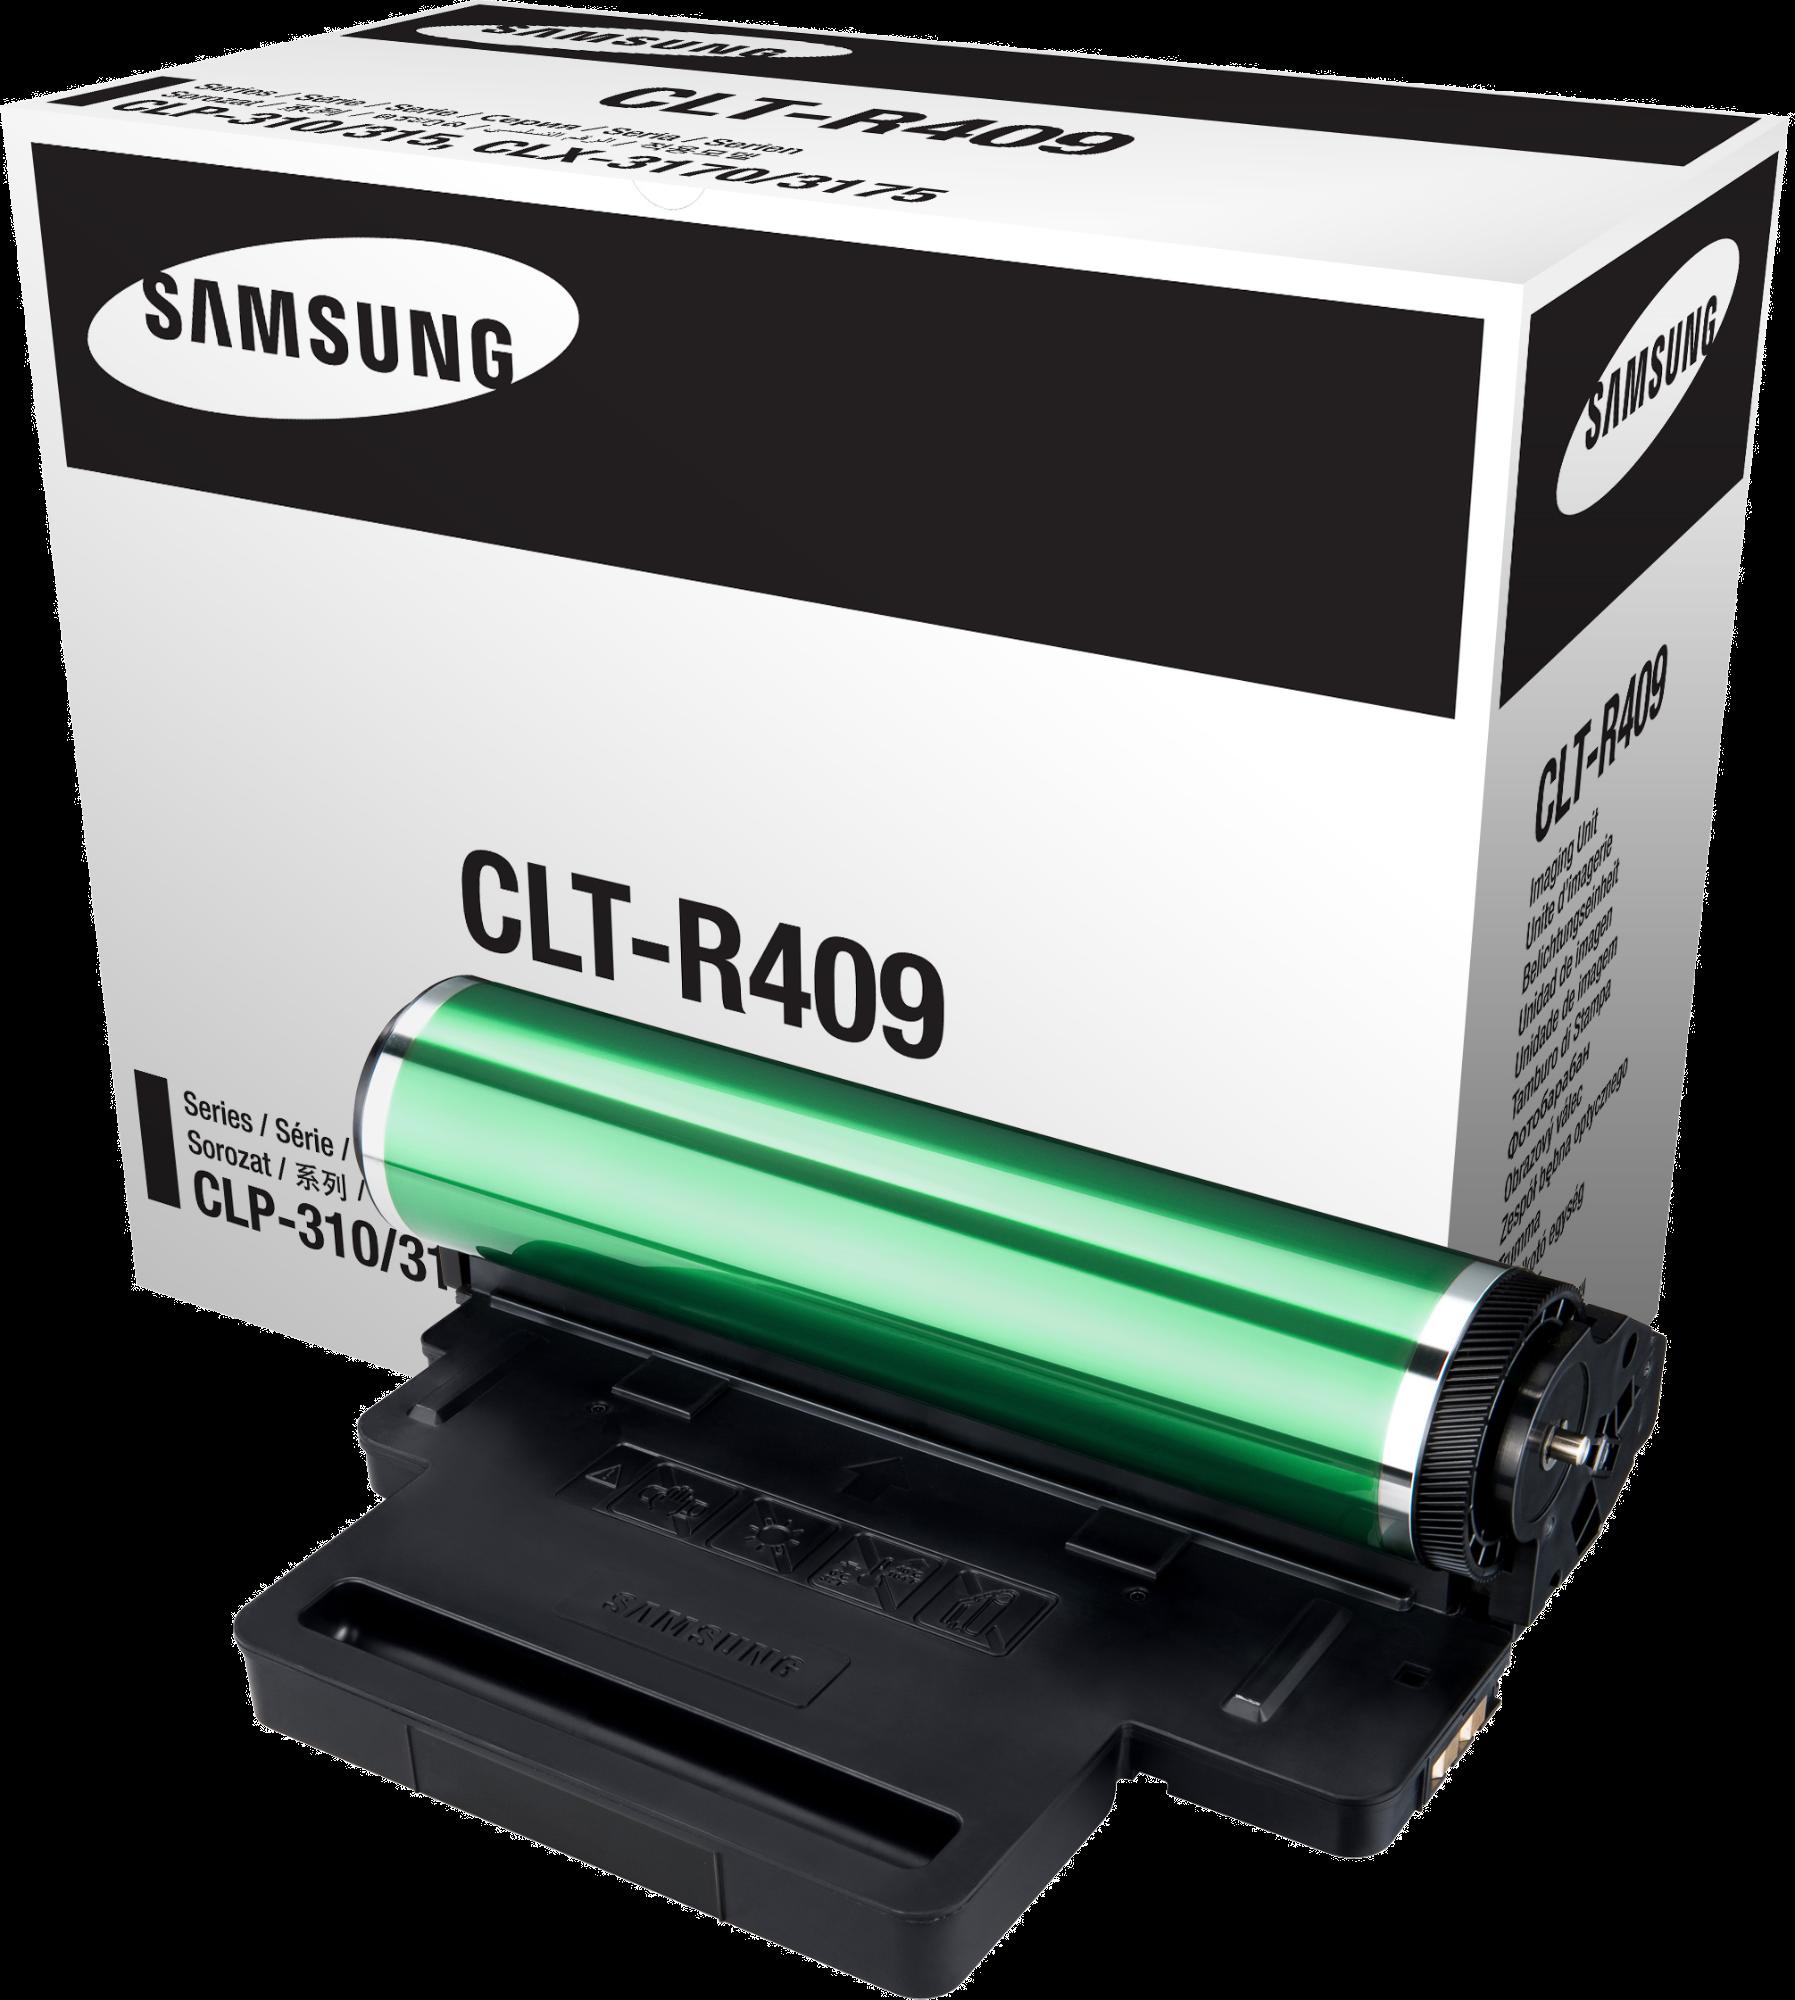 Samsung CLT-R409 1 pieza(s)